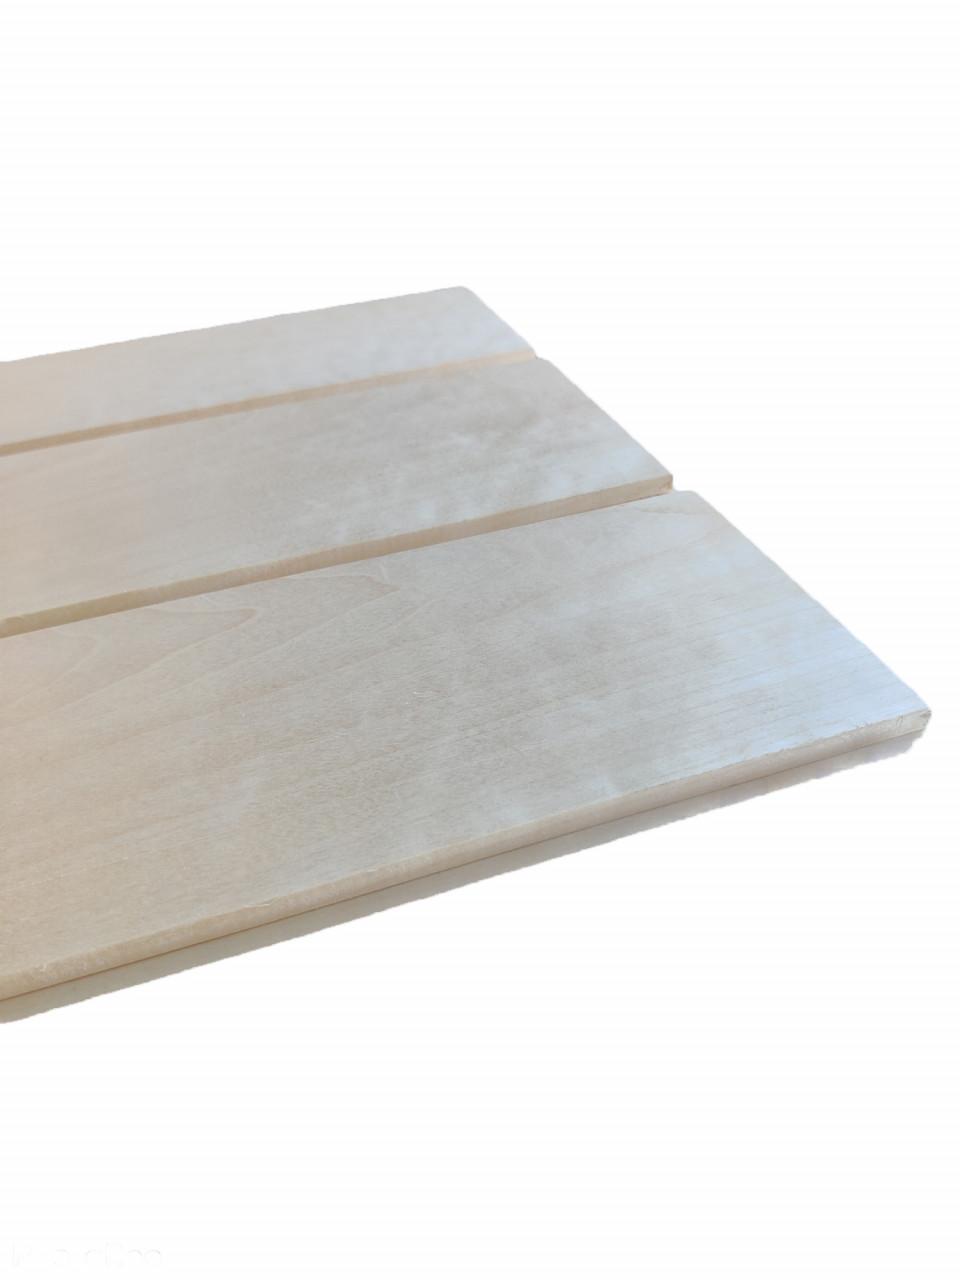 Brede saunaschroot Espen 15x120mm (werkend 110mm) - diverse lengtes